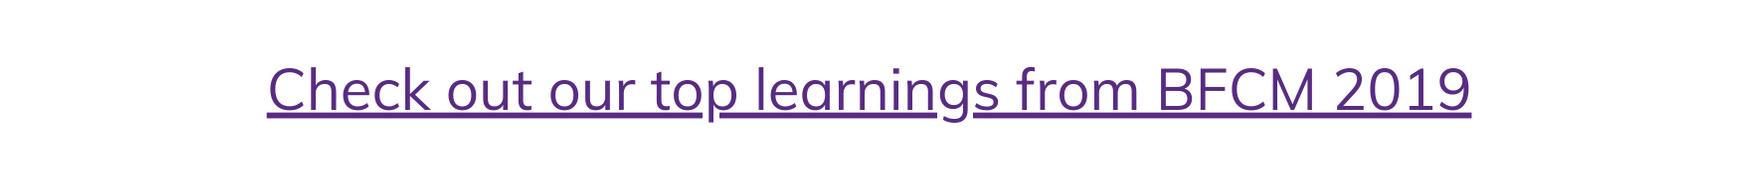 Bfcm 2019 Learnings